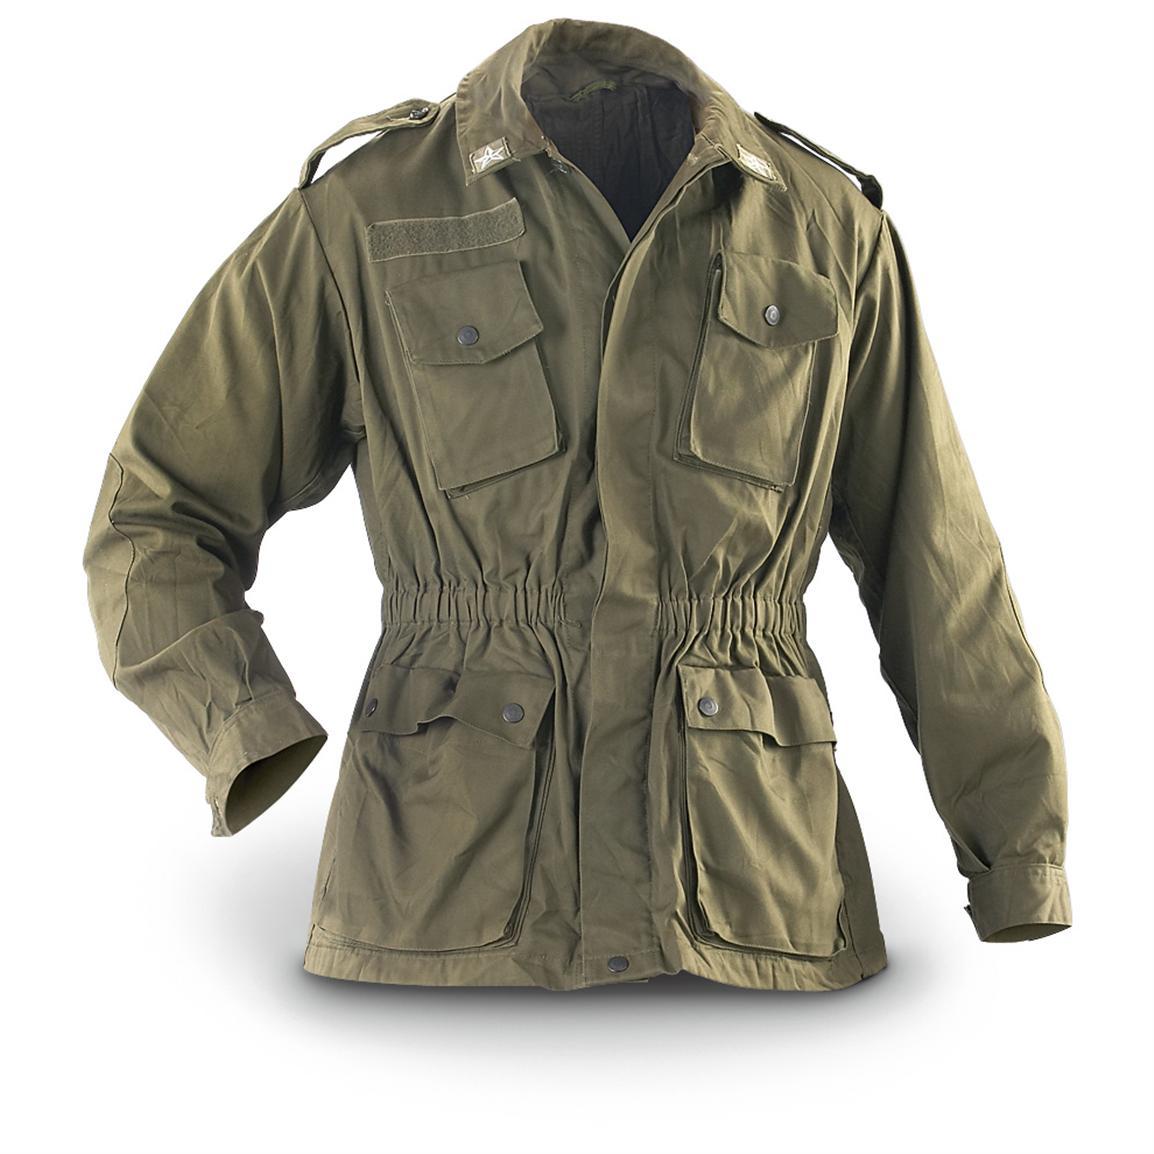 military jacket 2 used italian military combat jackets, olive drab XRDLYGC